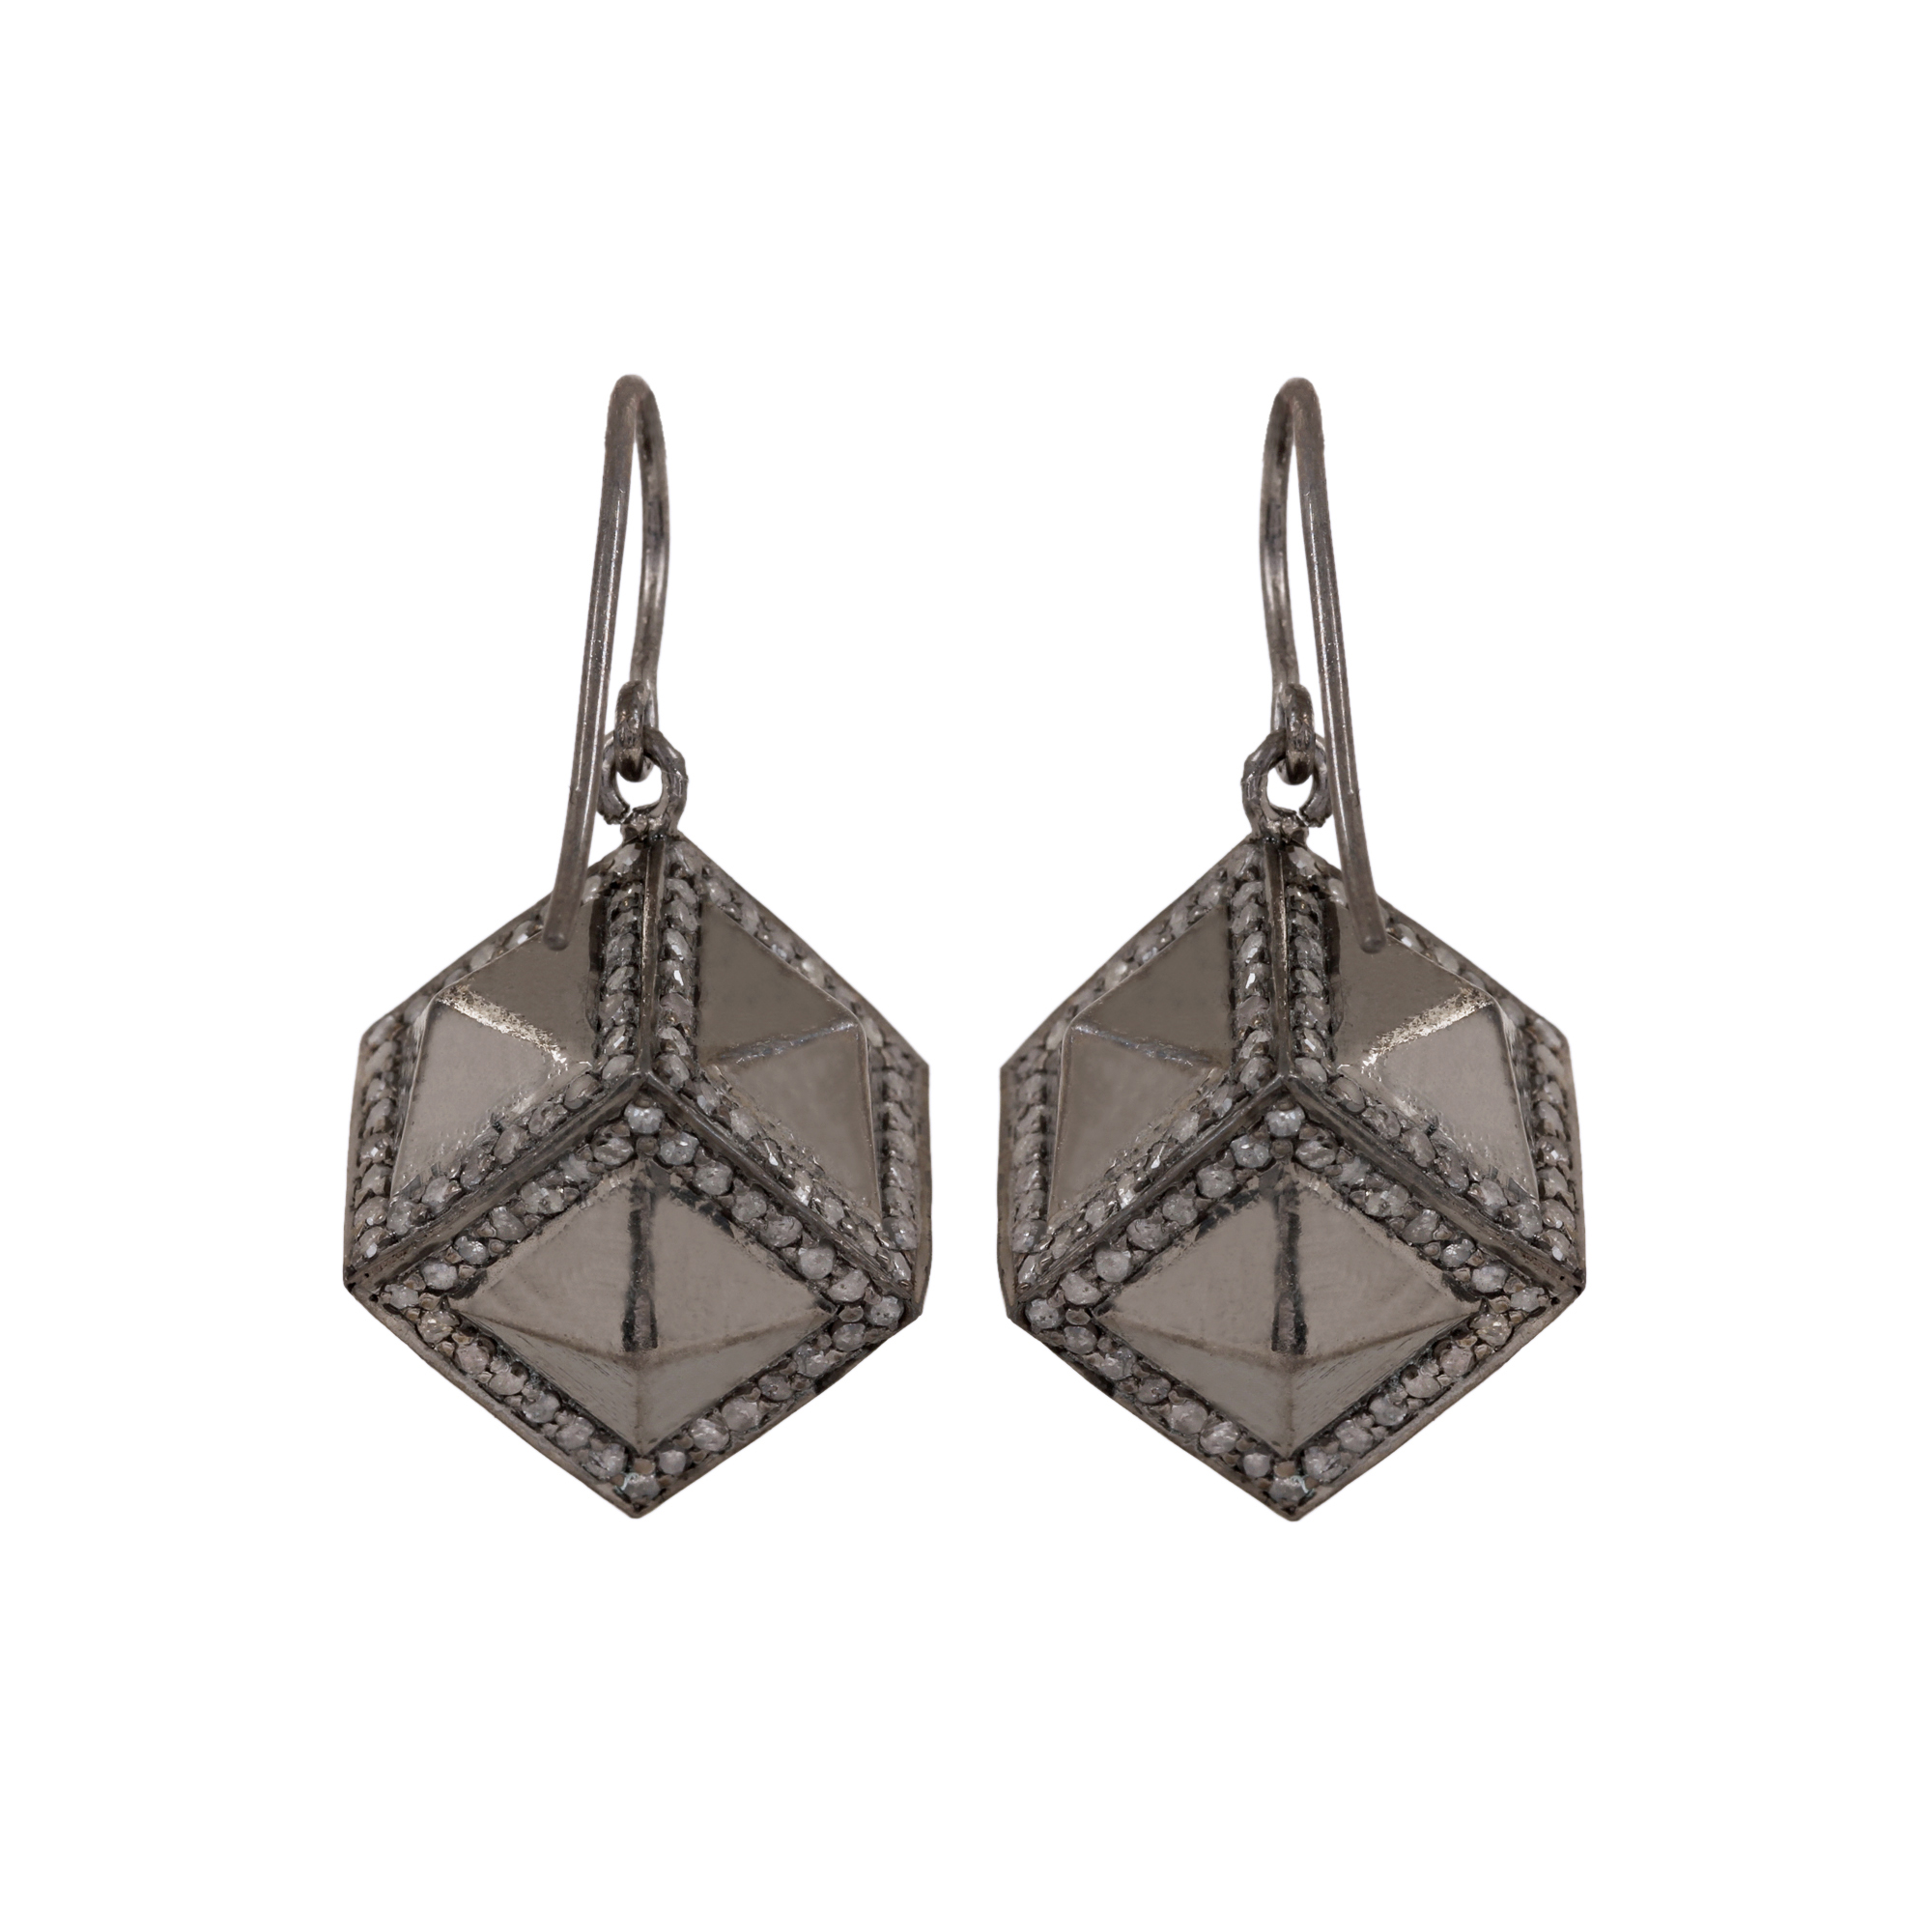 3.35ct natural diamond 925 sterling silver hook earrings